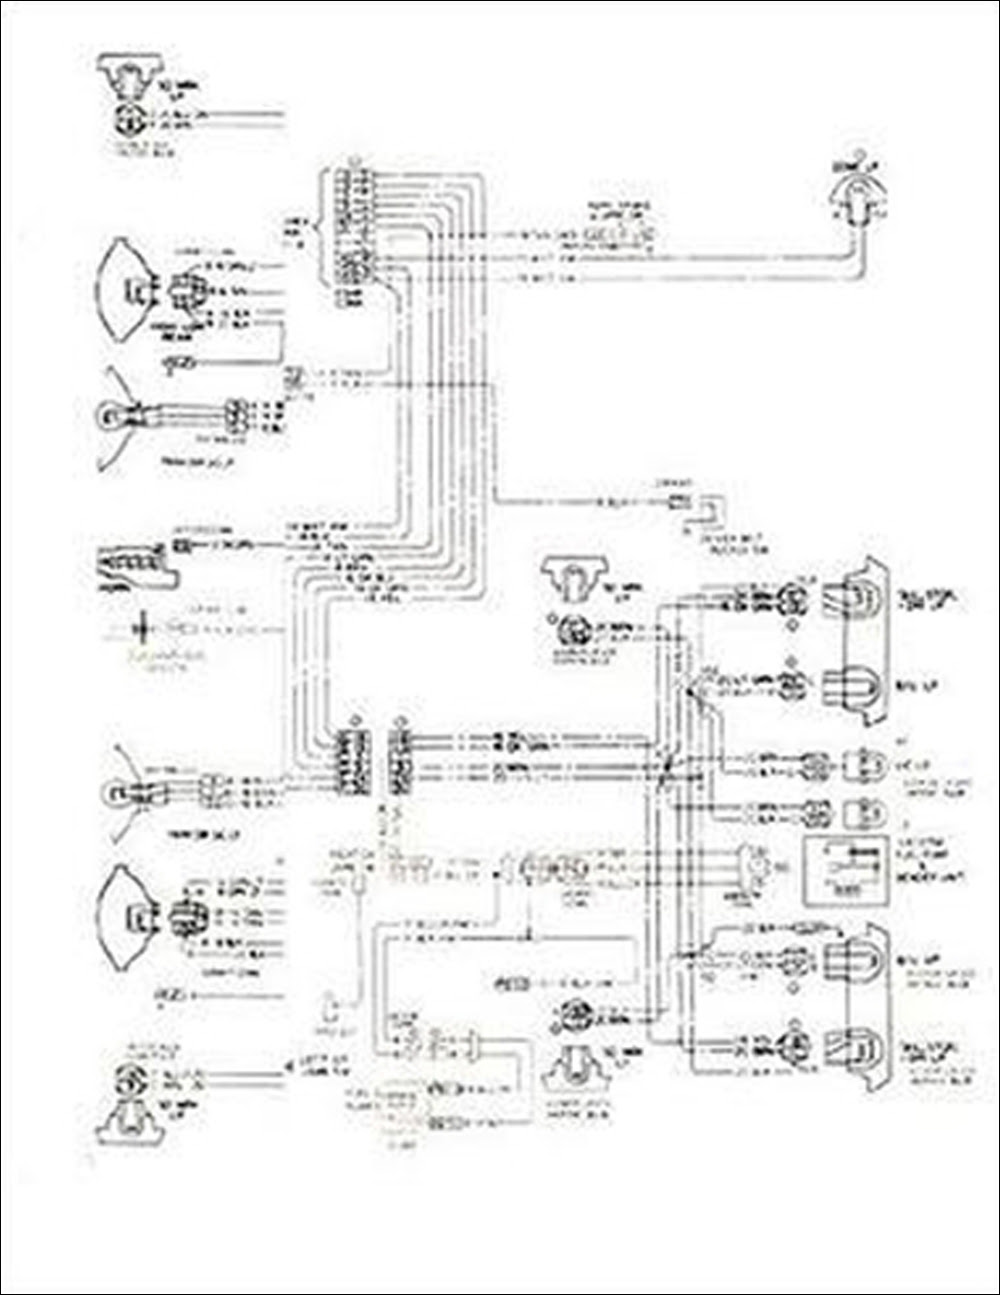 1973 Chevrolet Vega Wiring Diagram Wiring Diagrams Register Register Miglioribanche It